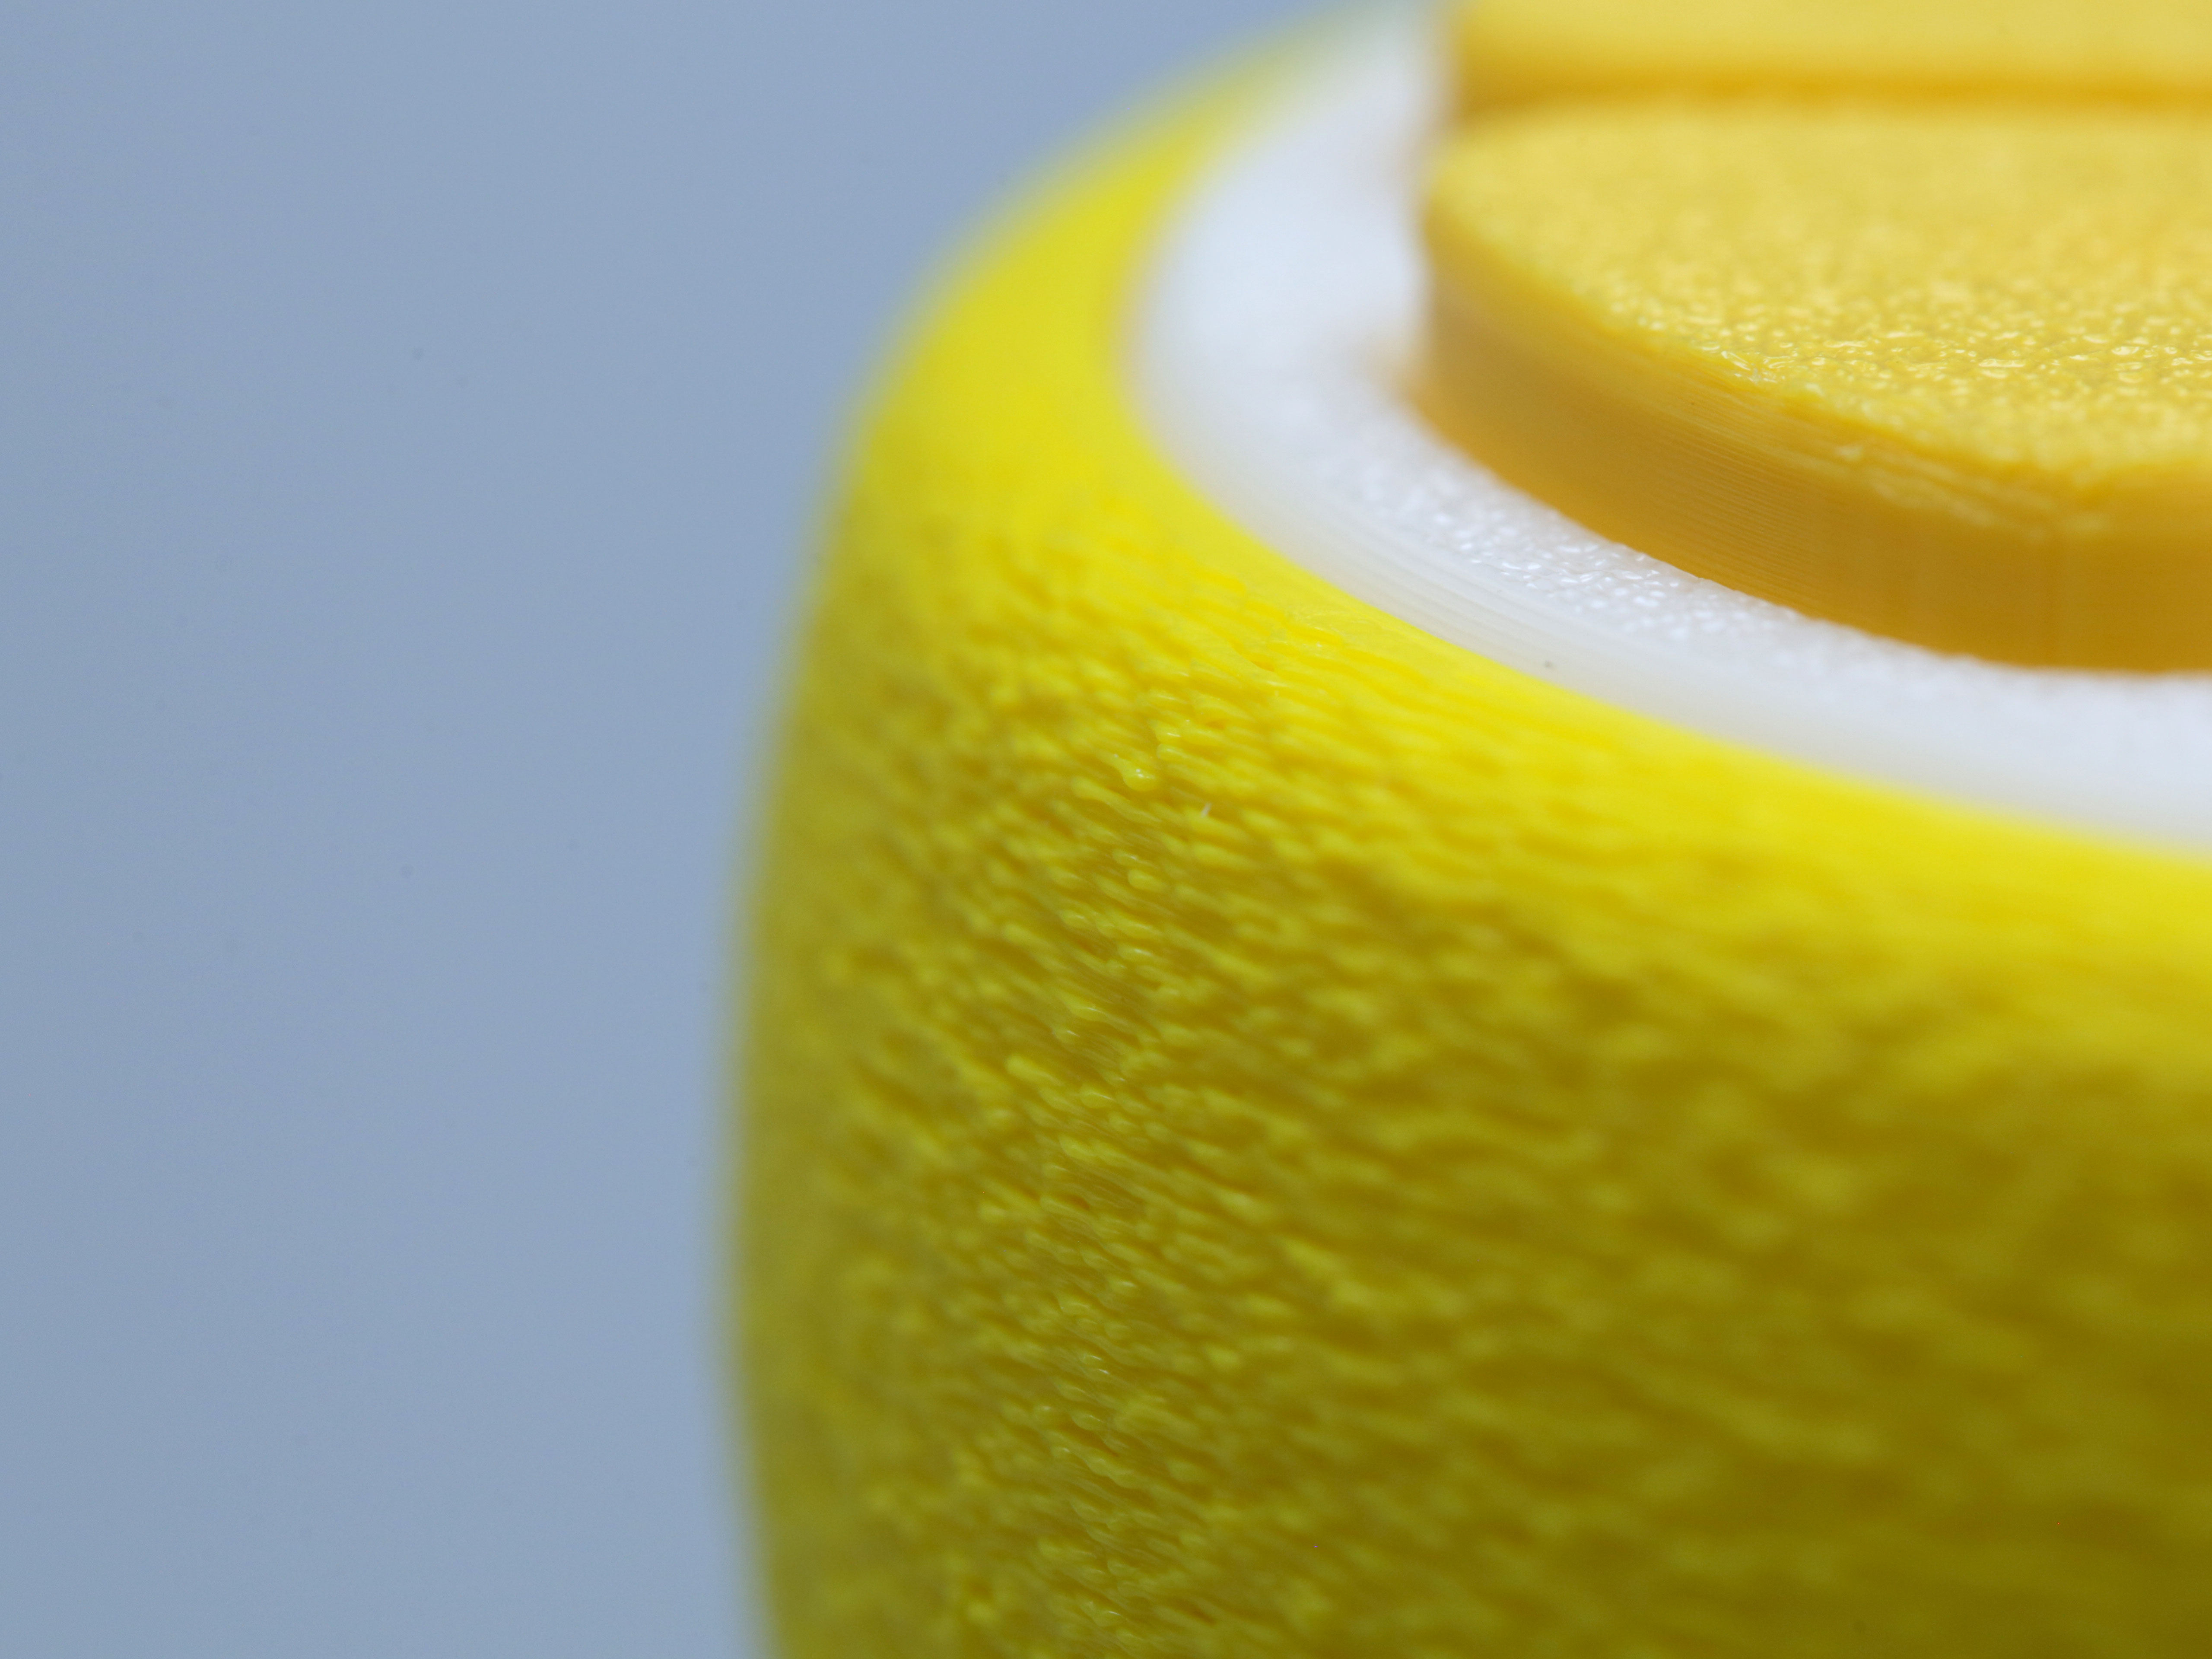 3d_printing_fuzzy-skin-closeup.jpg